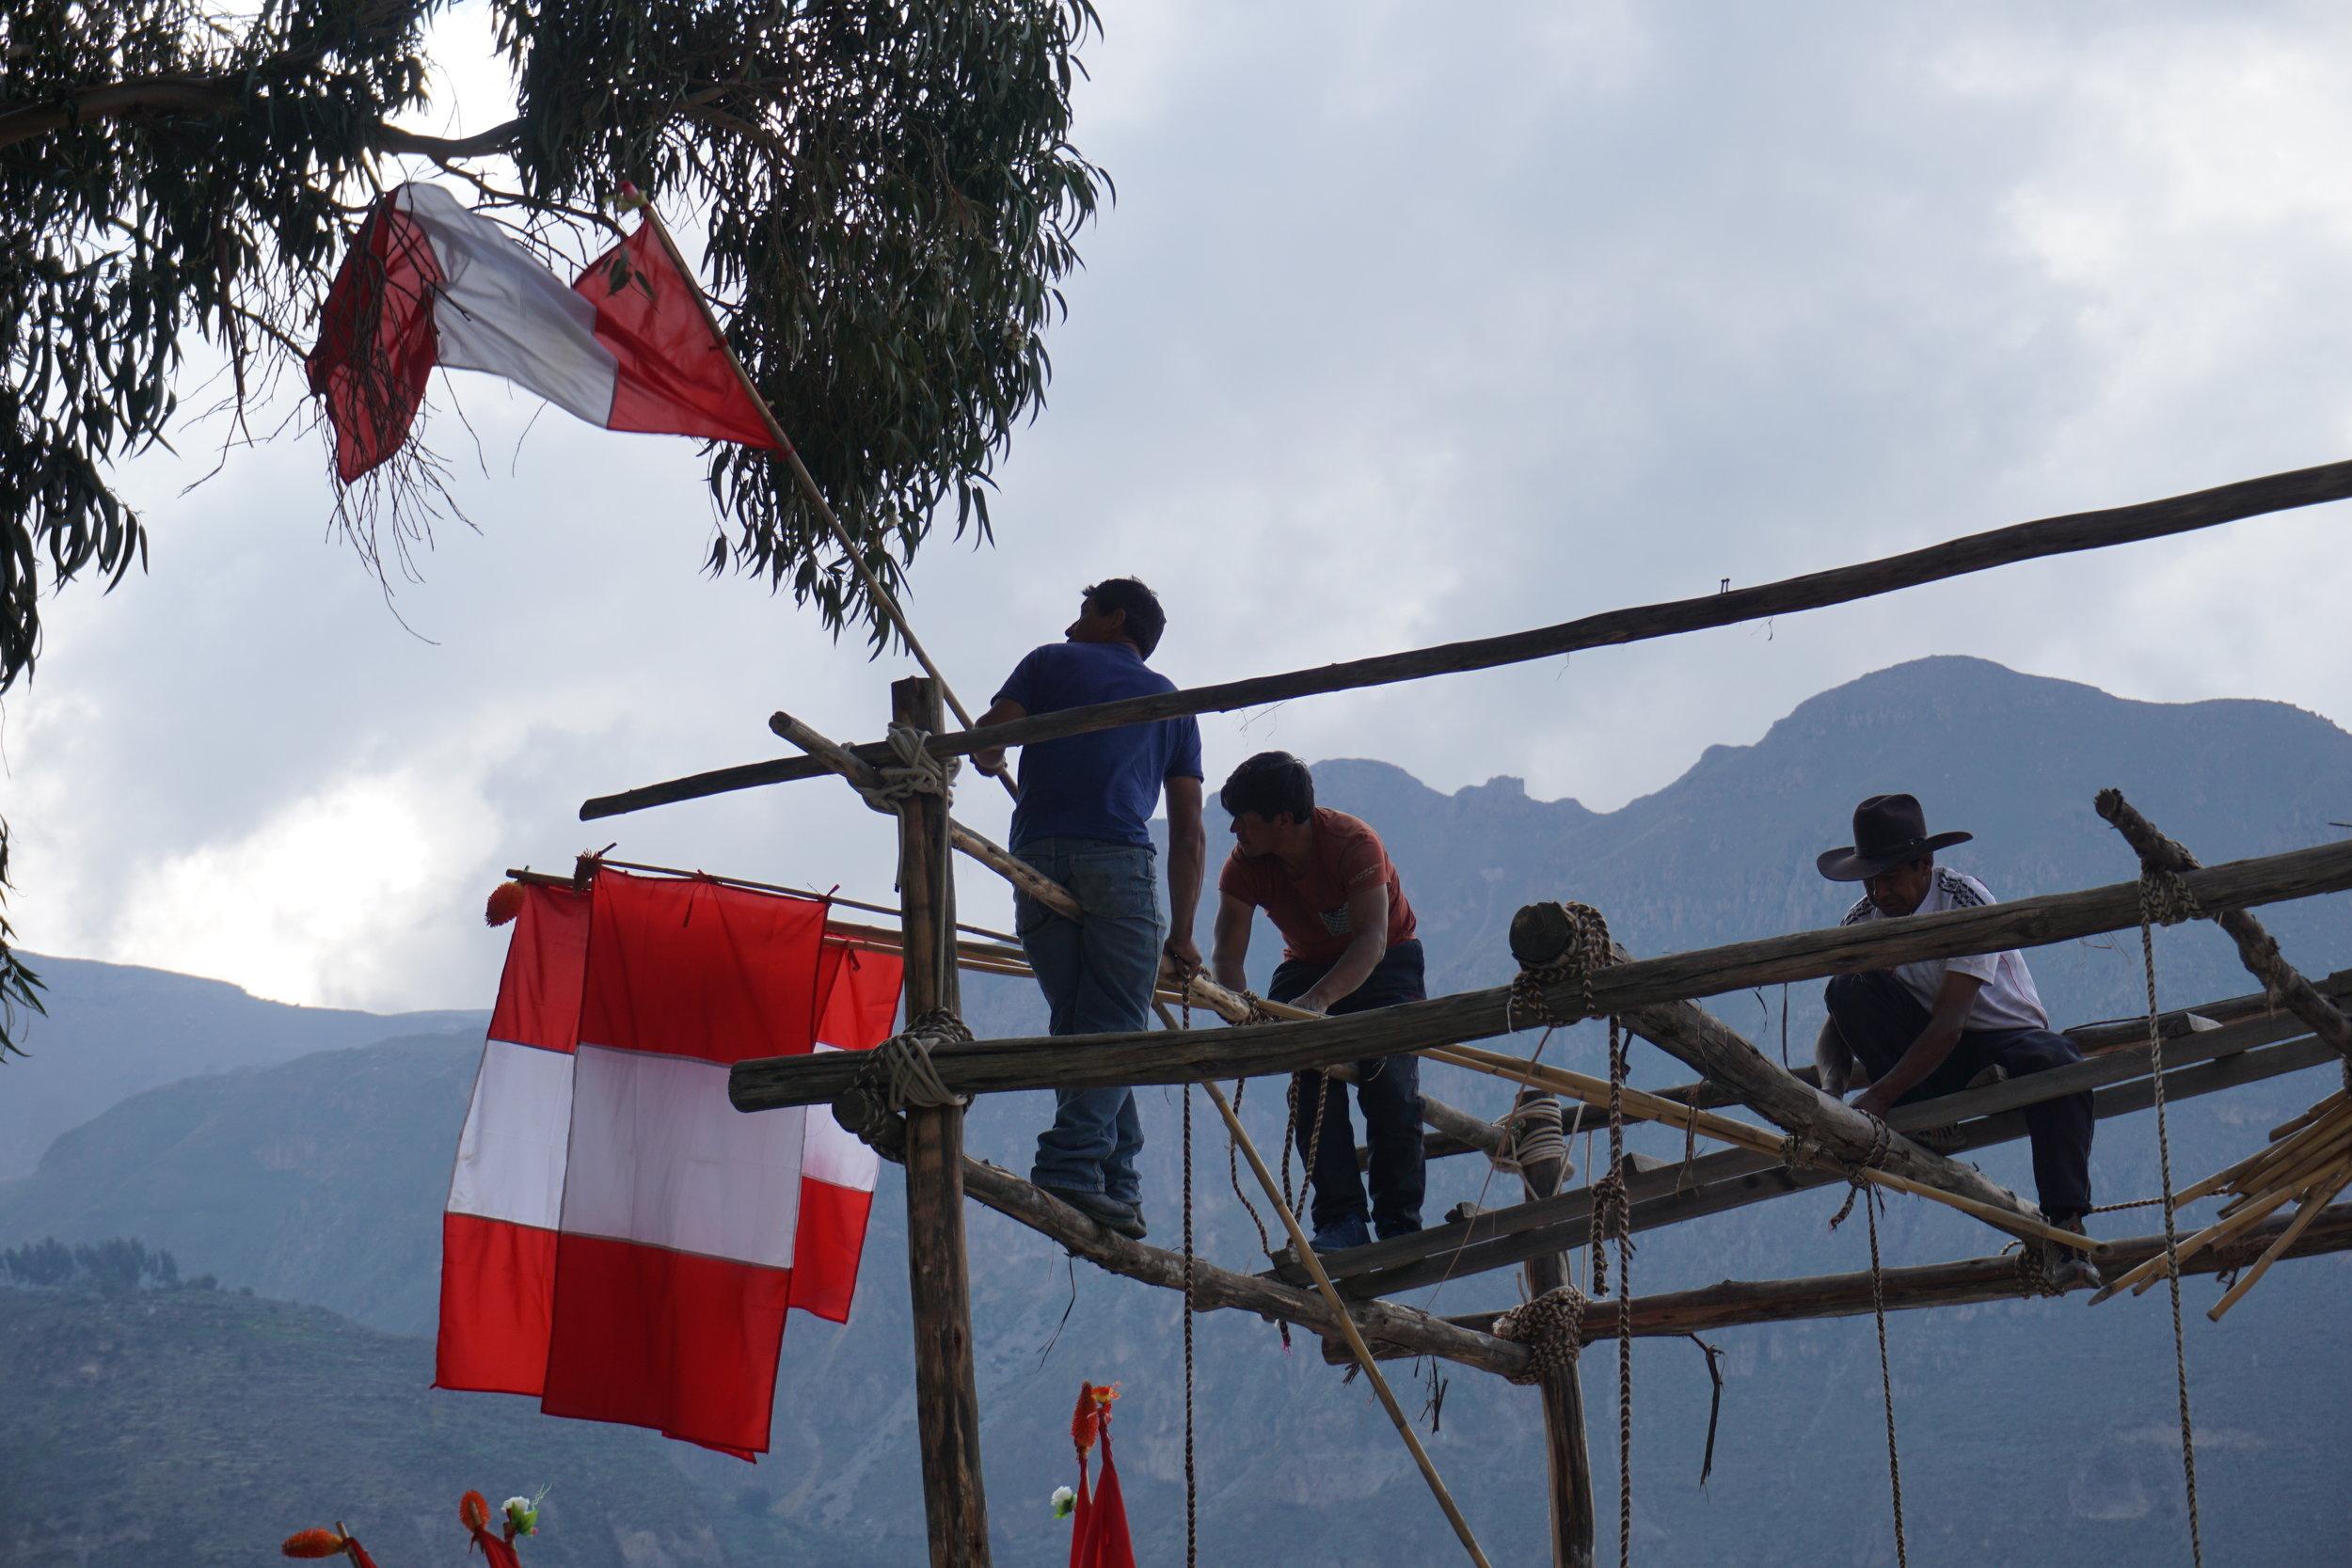 Villagers preparing for the celebration of the Fiesta de la Virgen de Candelaria in the town square of Maca.